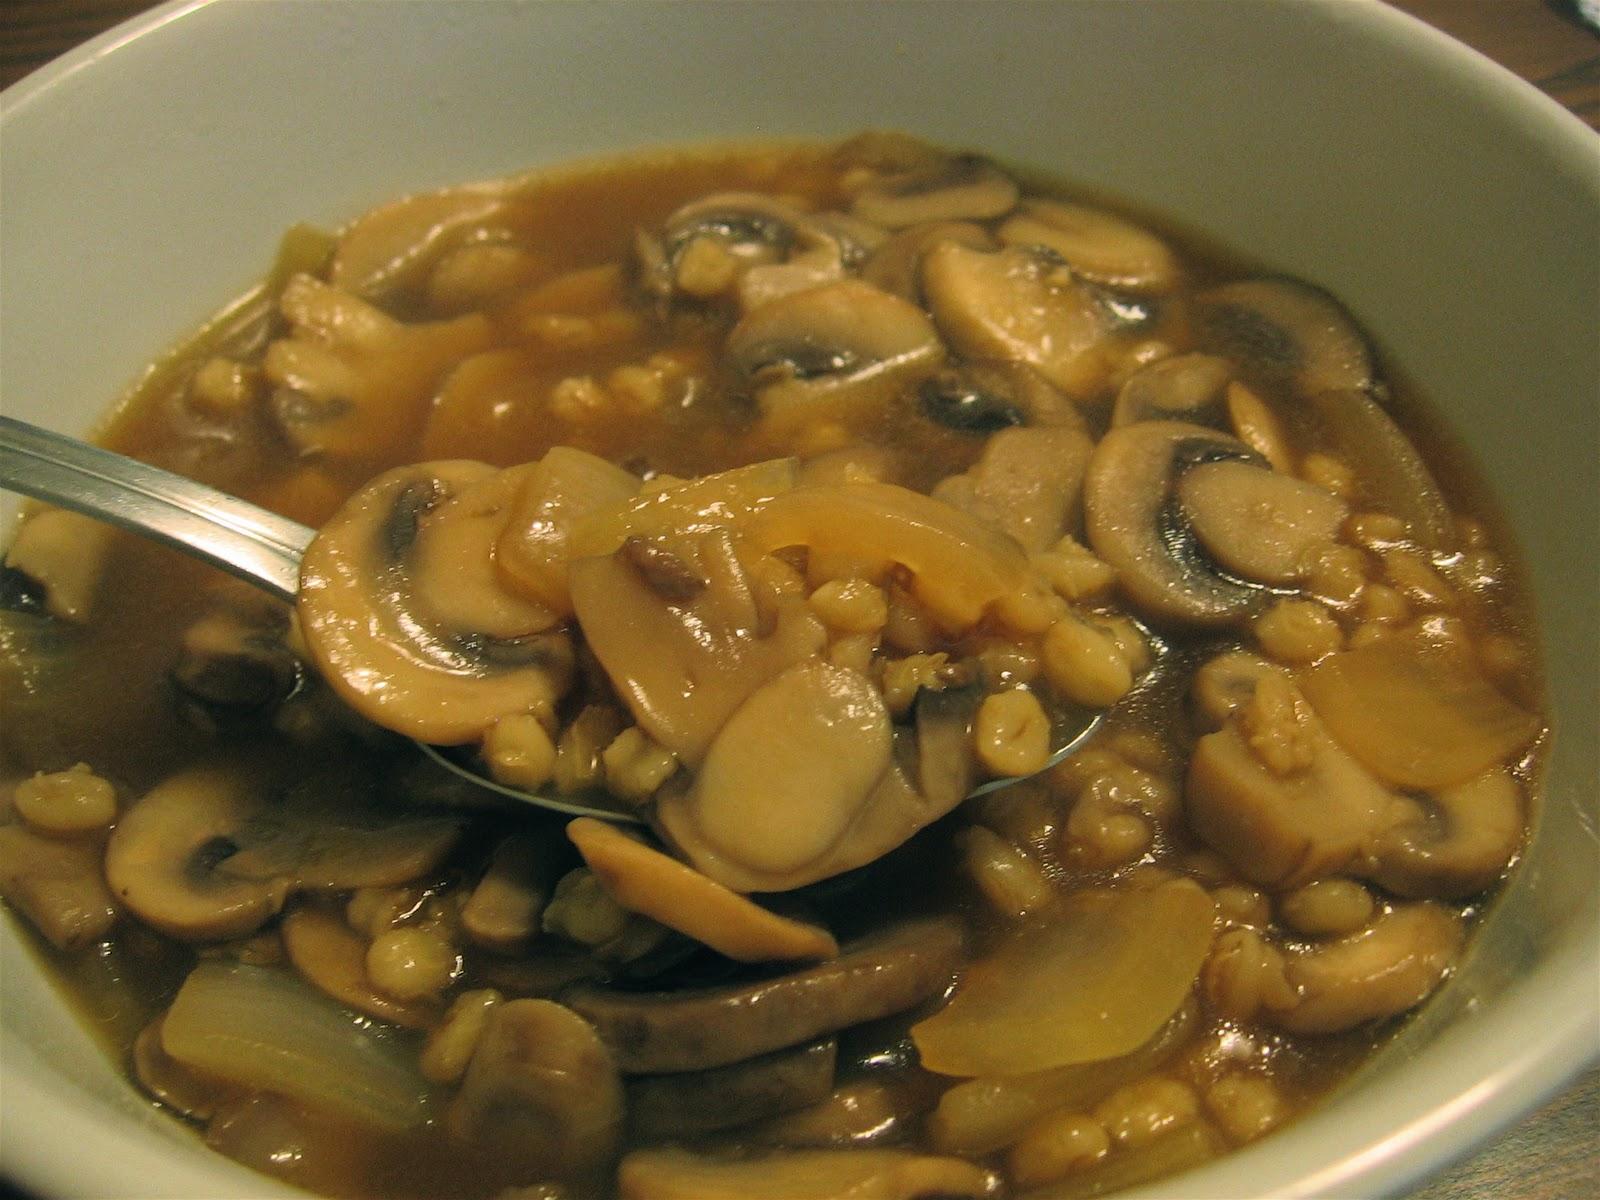 Recipes For Laughter: Mushroom Barley Soup